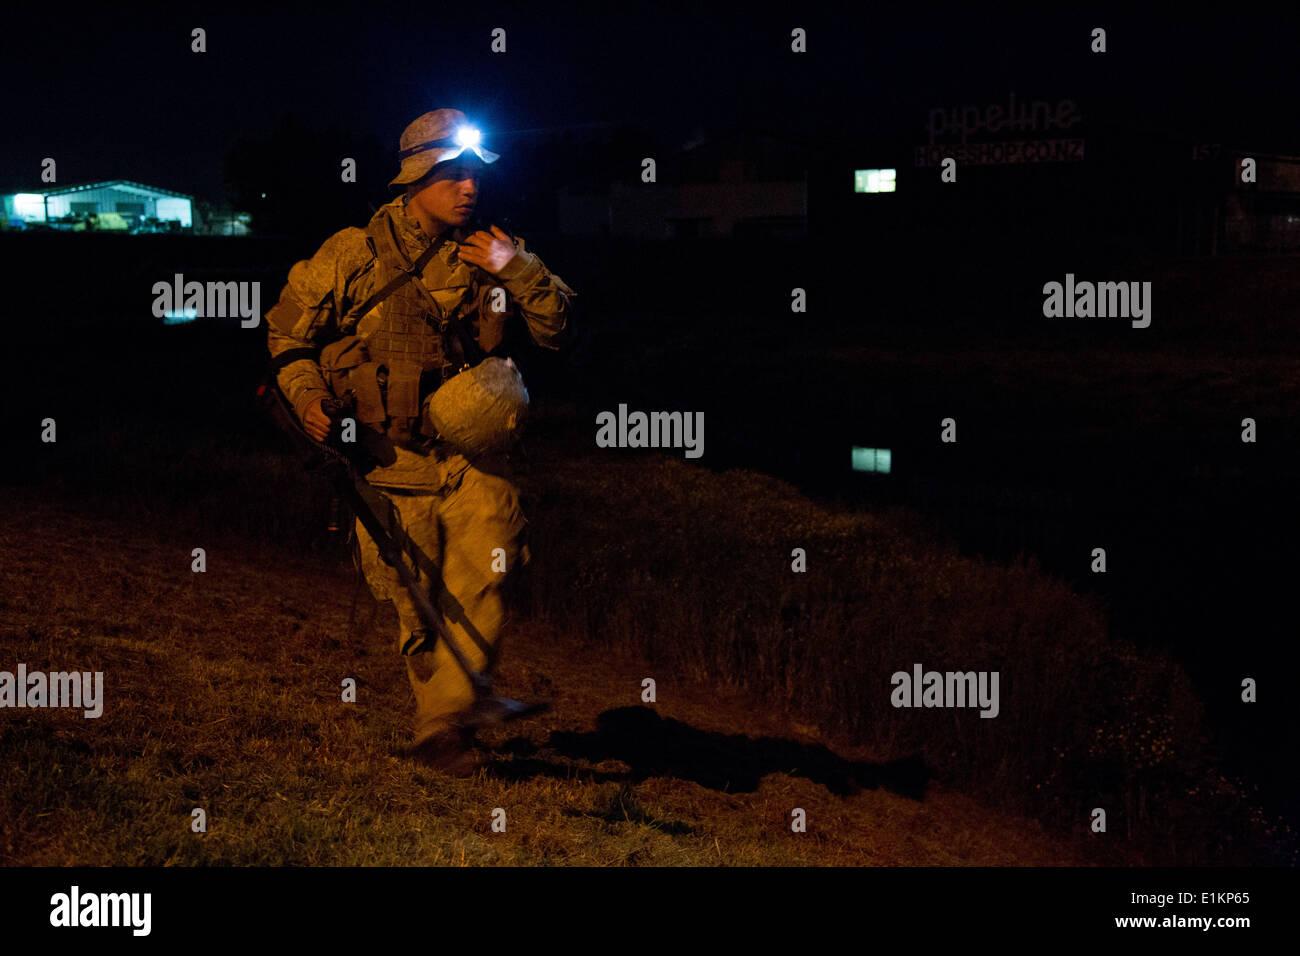 New Zealand Soldat zugewiesen 3. Platoon, Alpha Company, Task Group rot sucht simulierten improvisierte explosive Stockbild